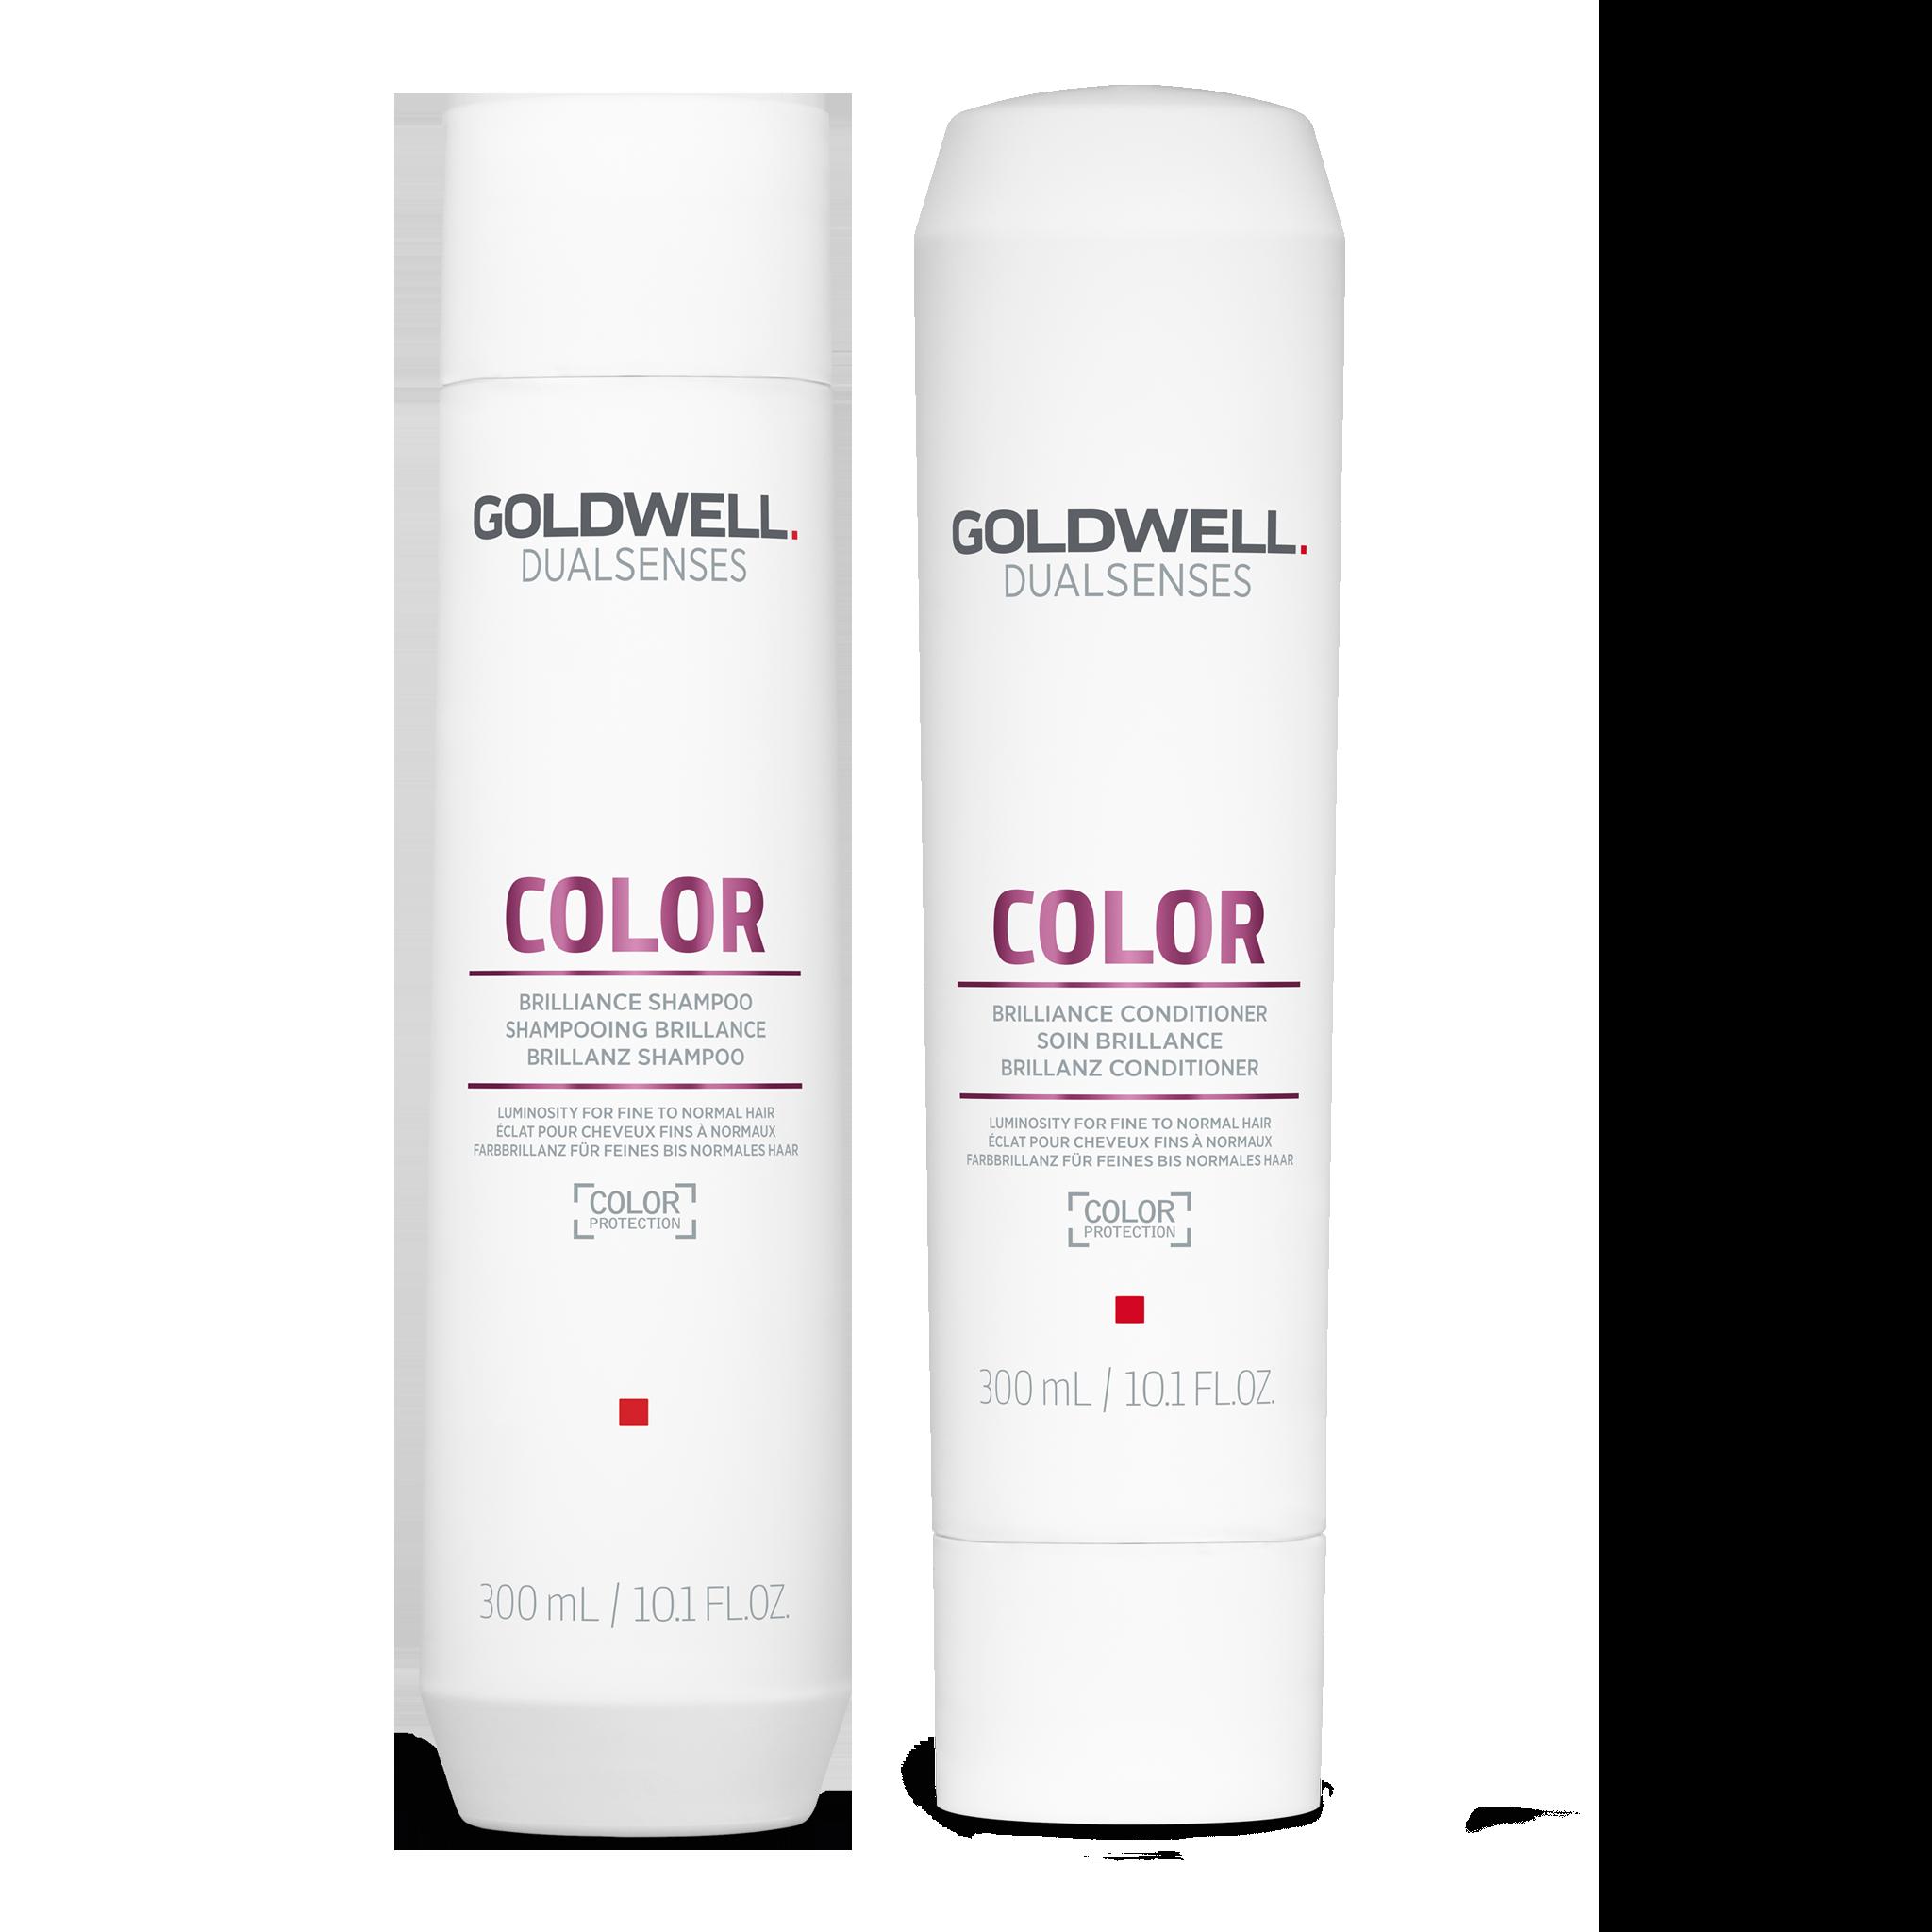 Goldwell Dualsenses Color Brilliance Shampoo & Conditioner 300ml